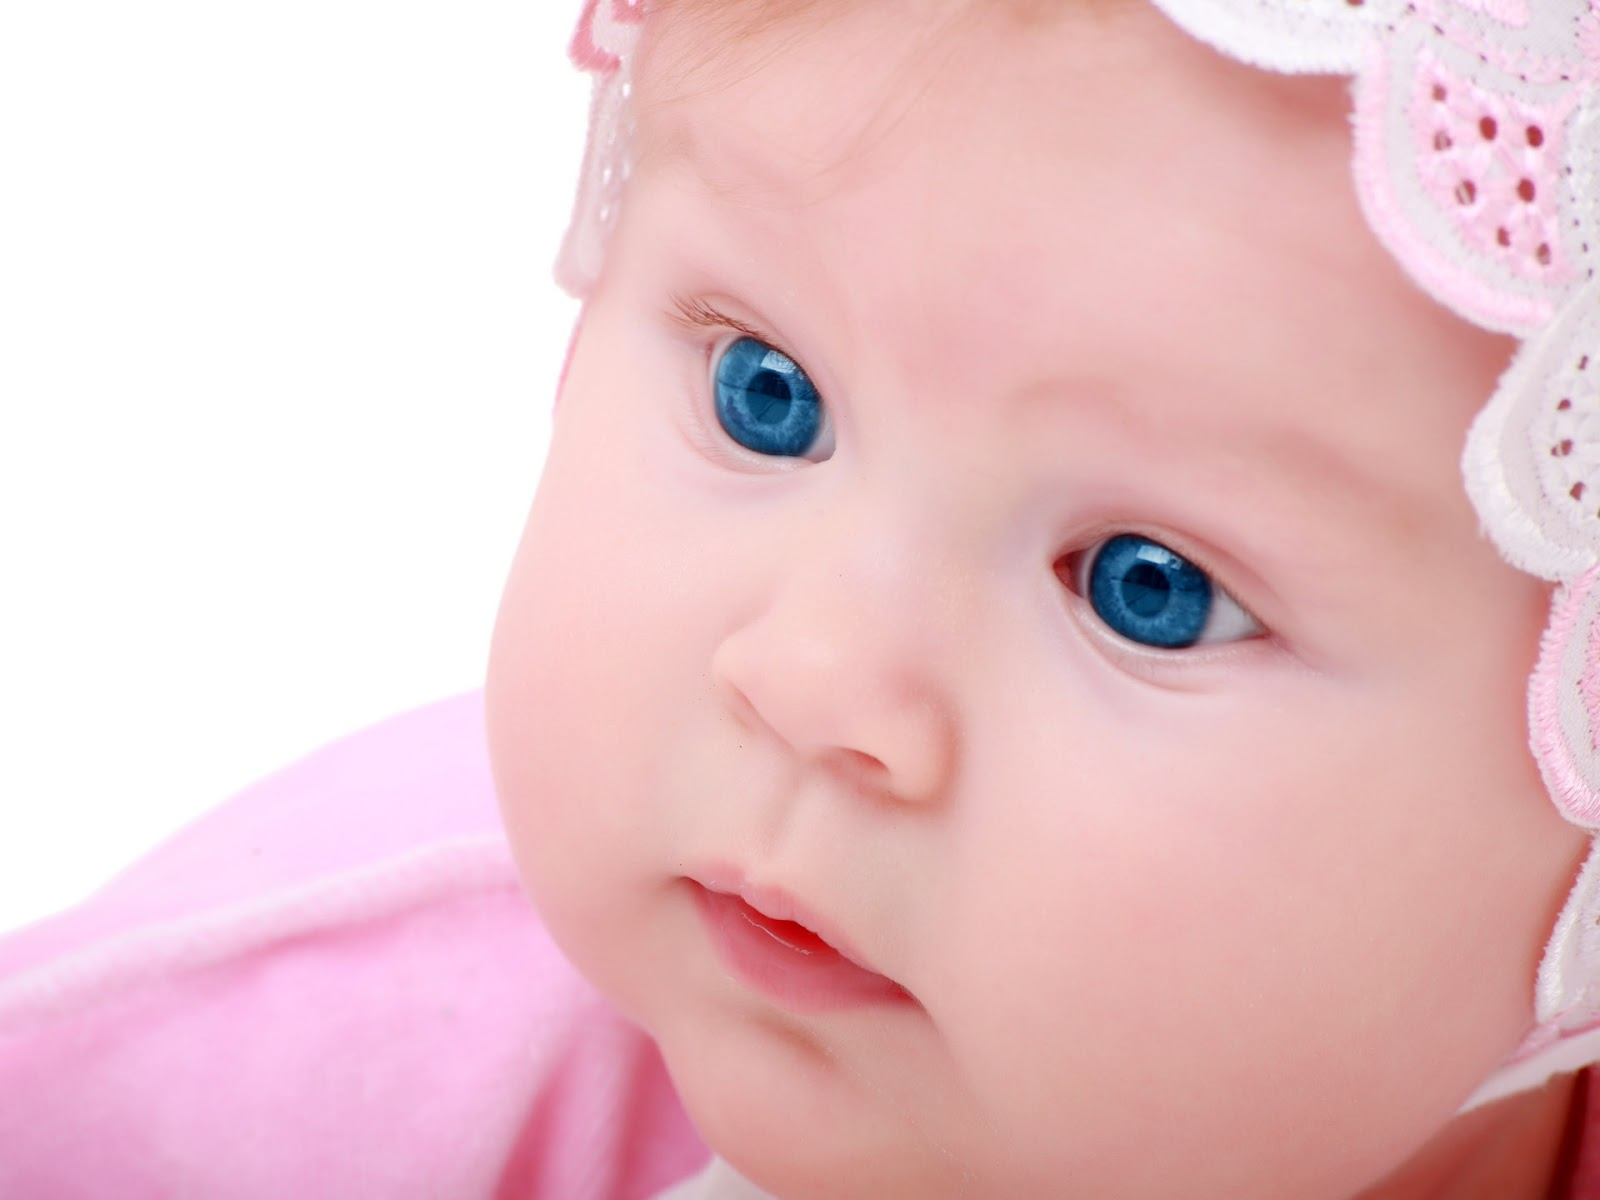 Foto Dan Gambar Bayi Lucu Menggemaskan Untuk Blackberry Anda